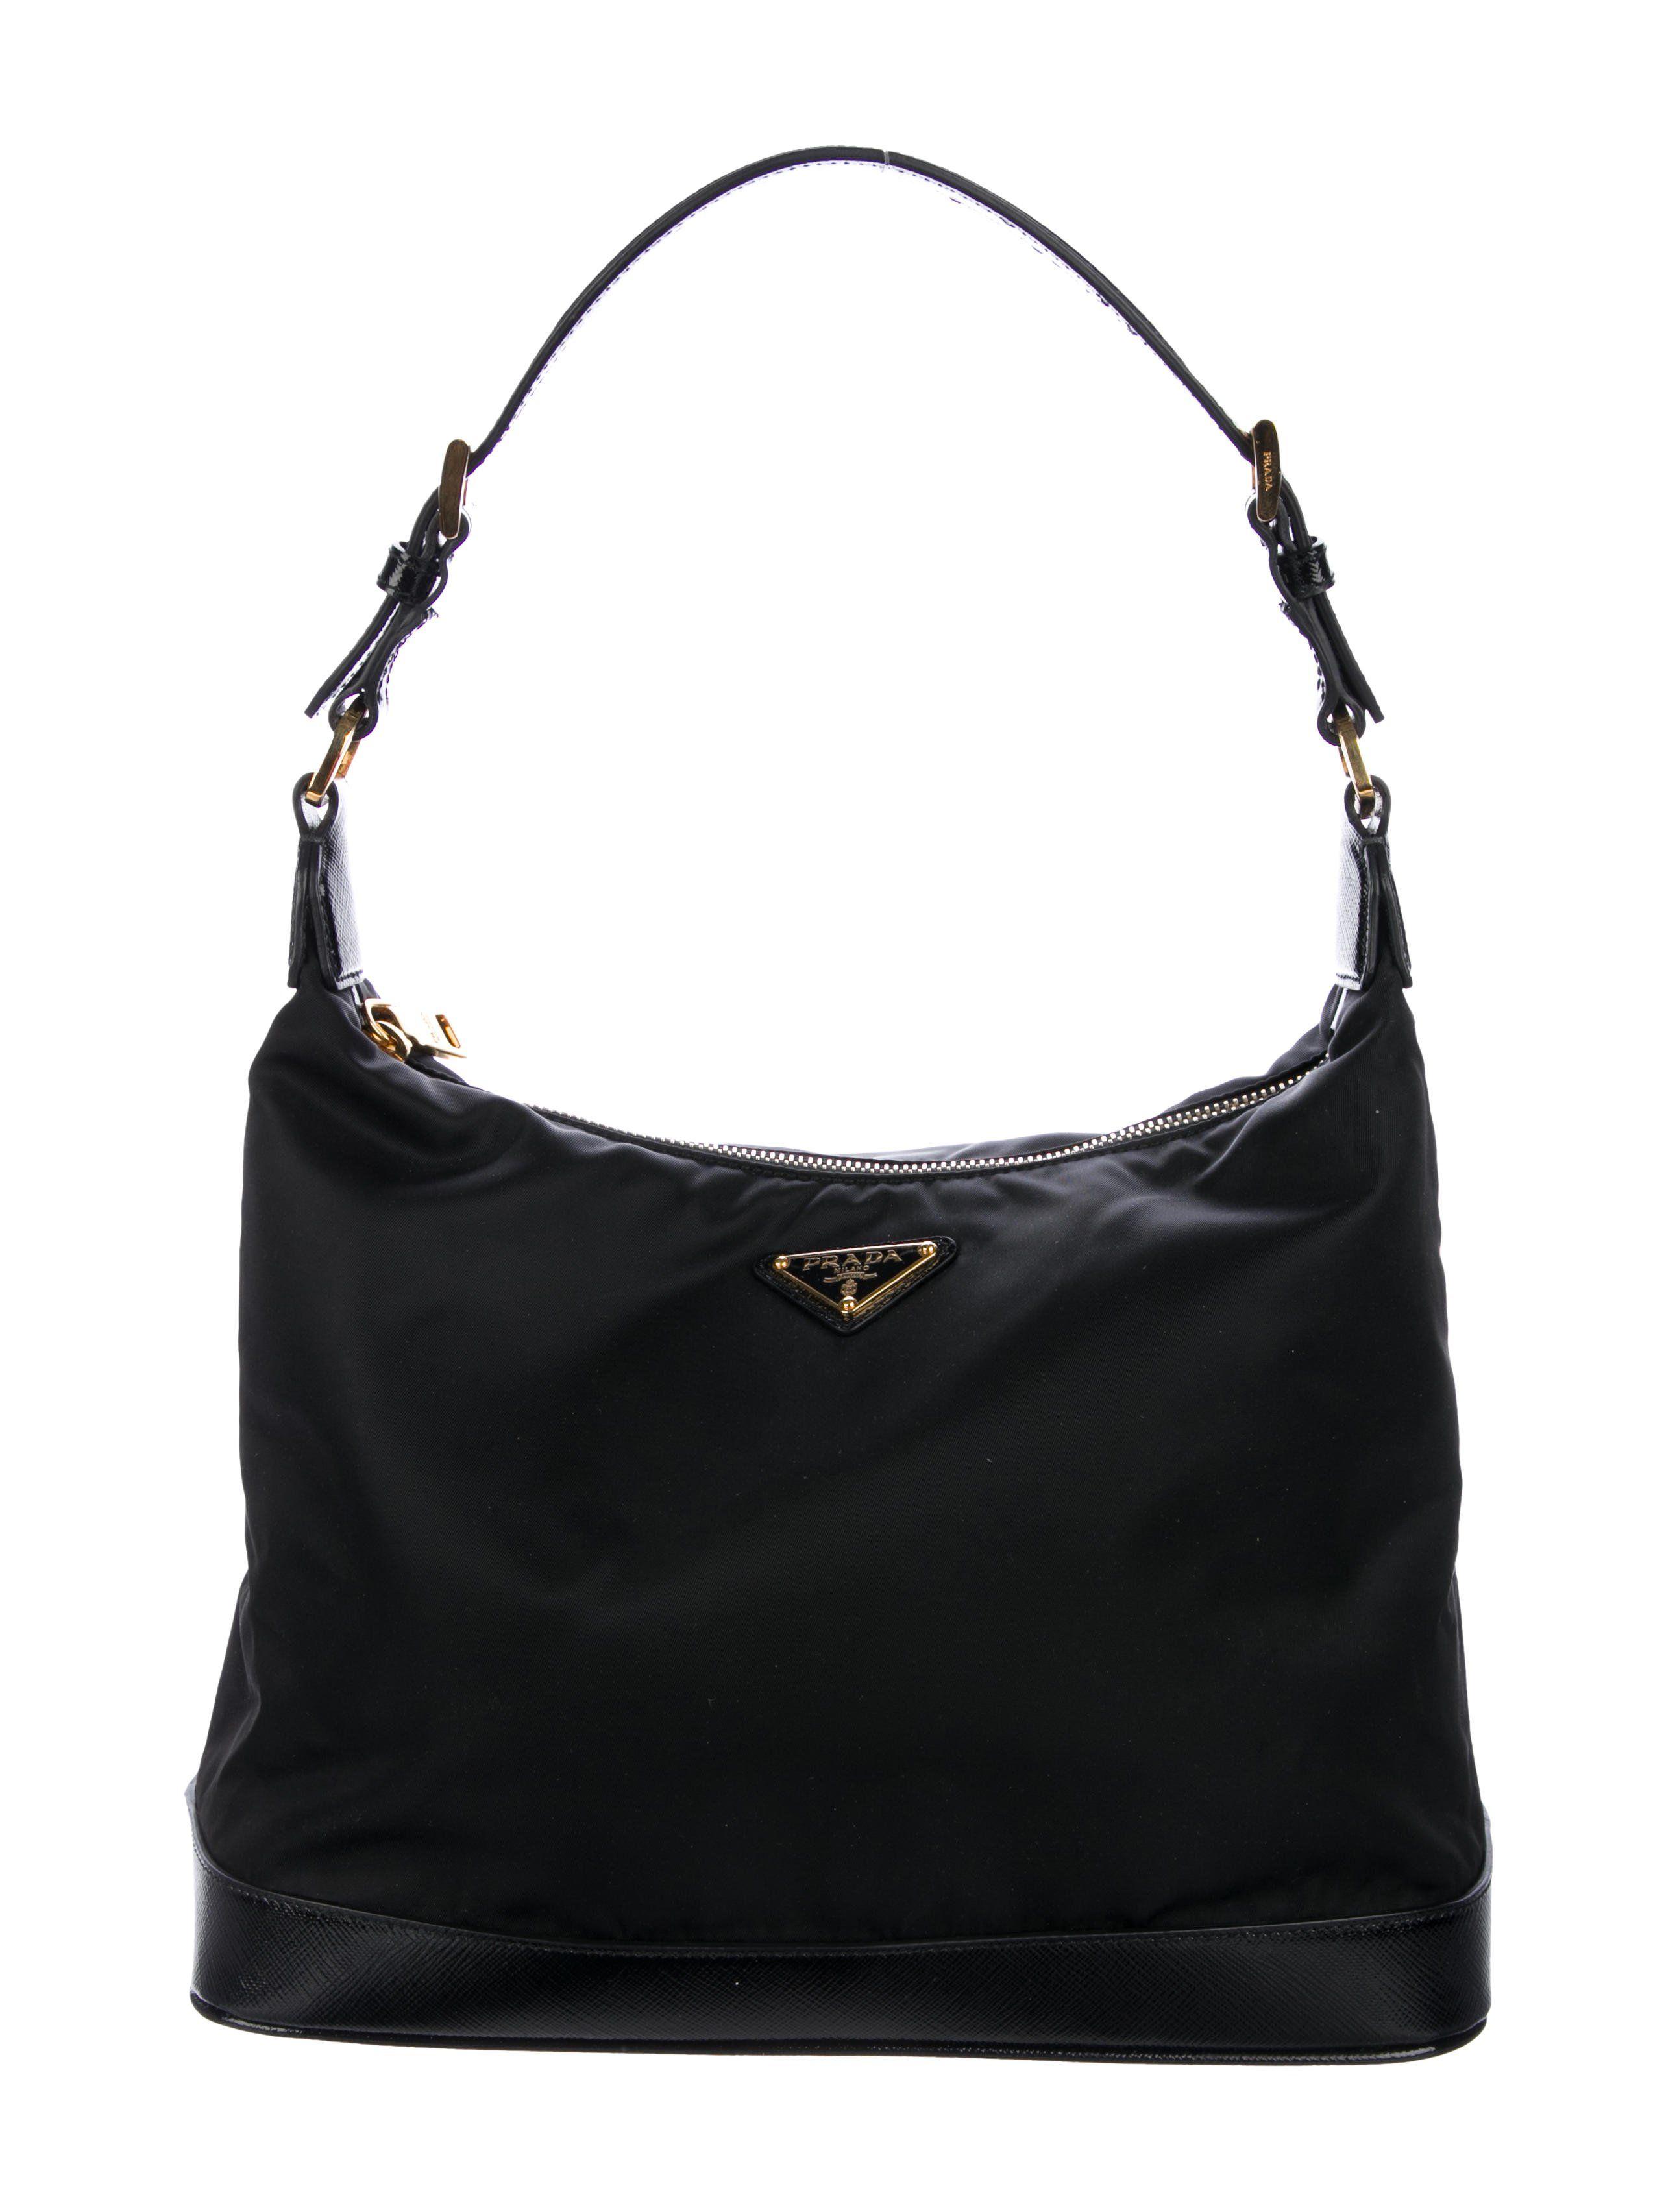 700fc35d47b Black Tessuto nylon Prada hobo with gold-tone hardware, single flat shoulder  strap,